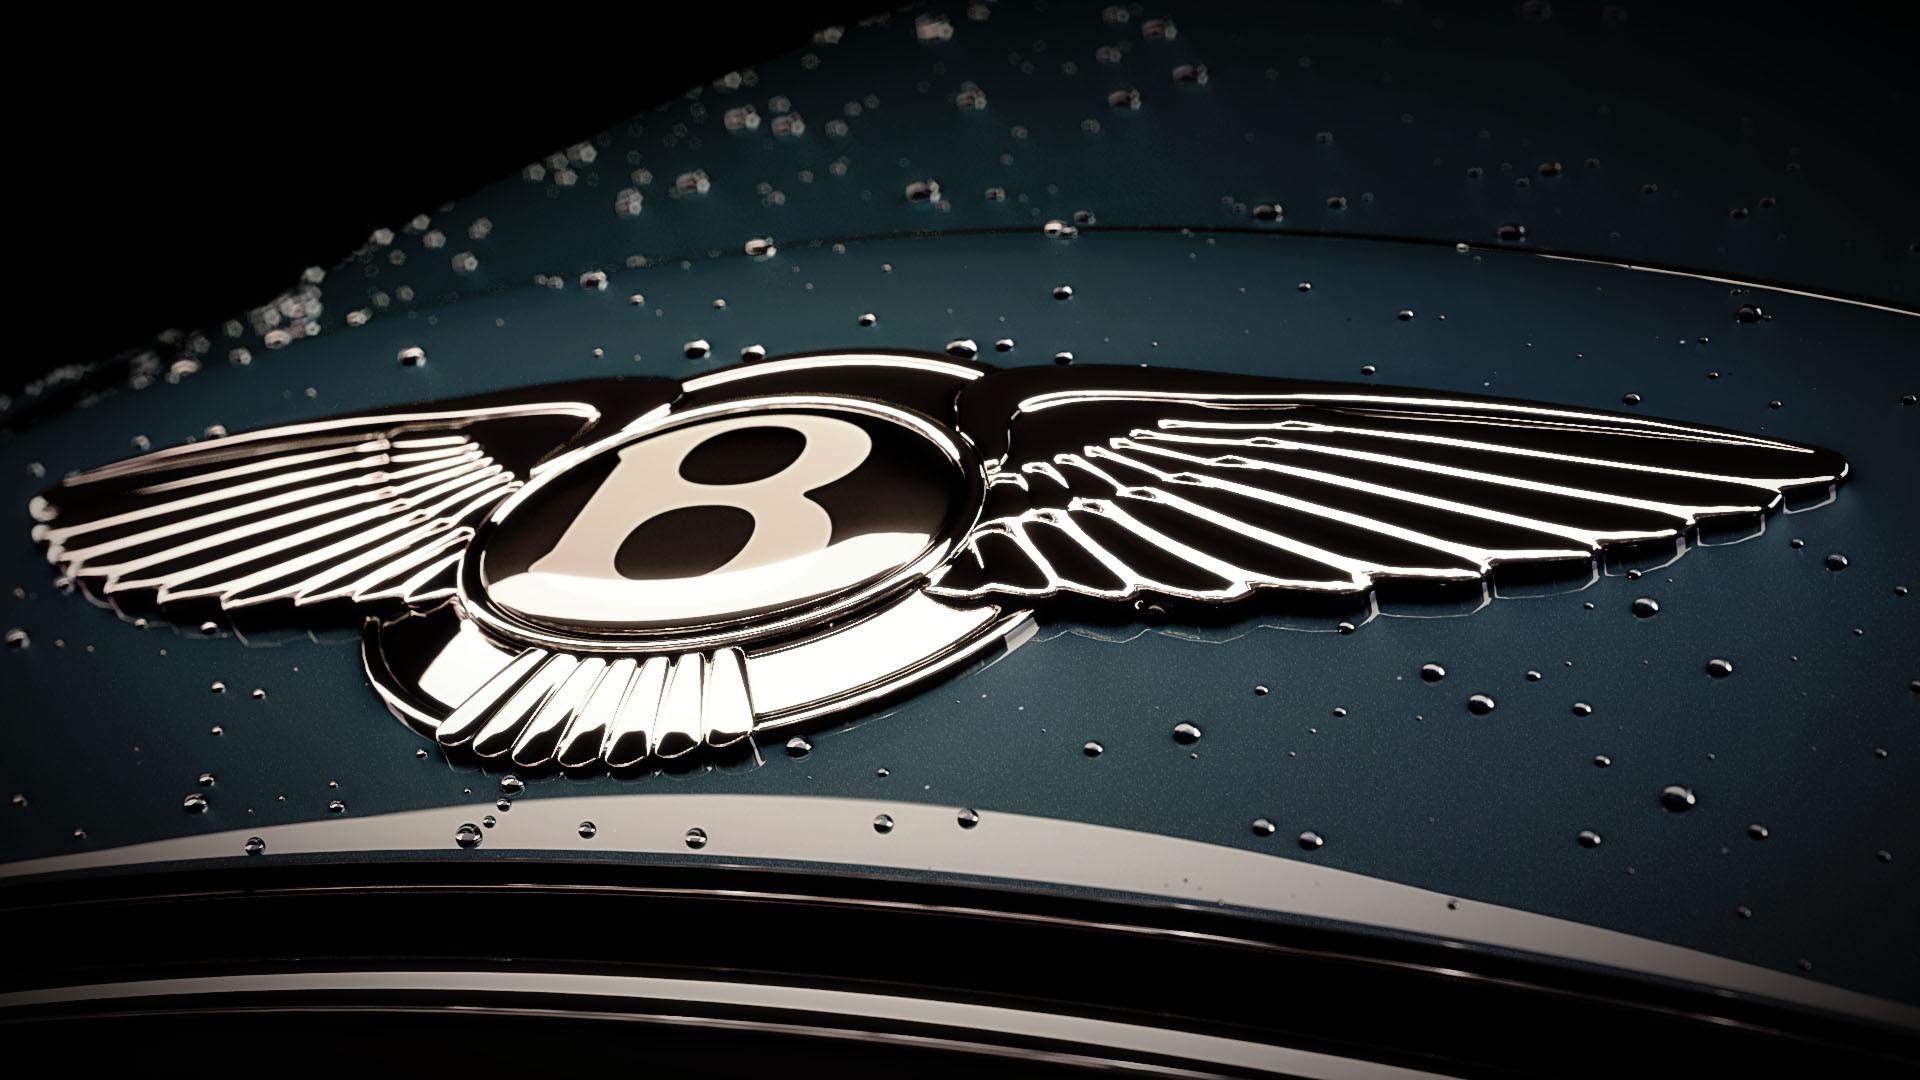 Fondos De Pantalla Hd Wallpapers Bentley Car Logo